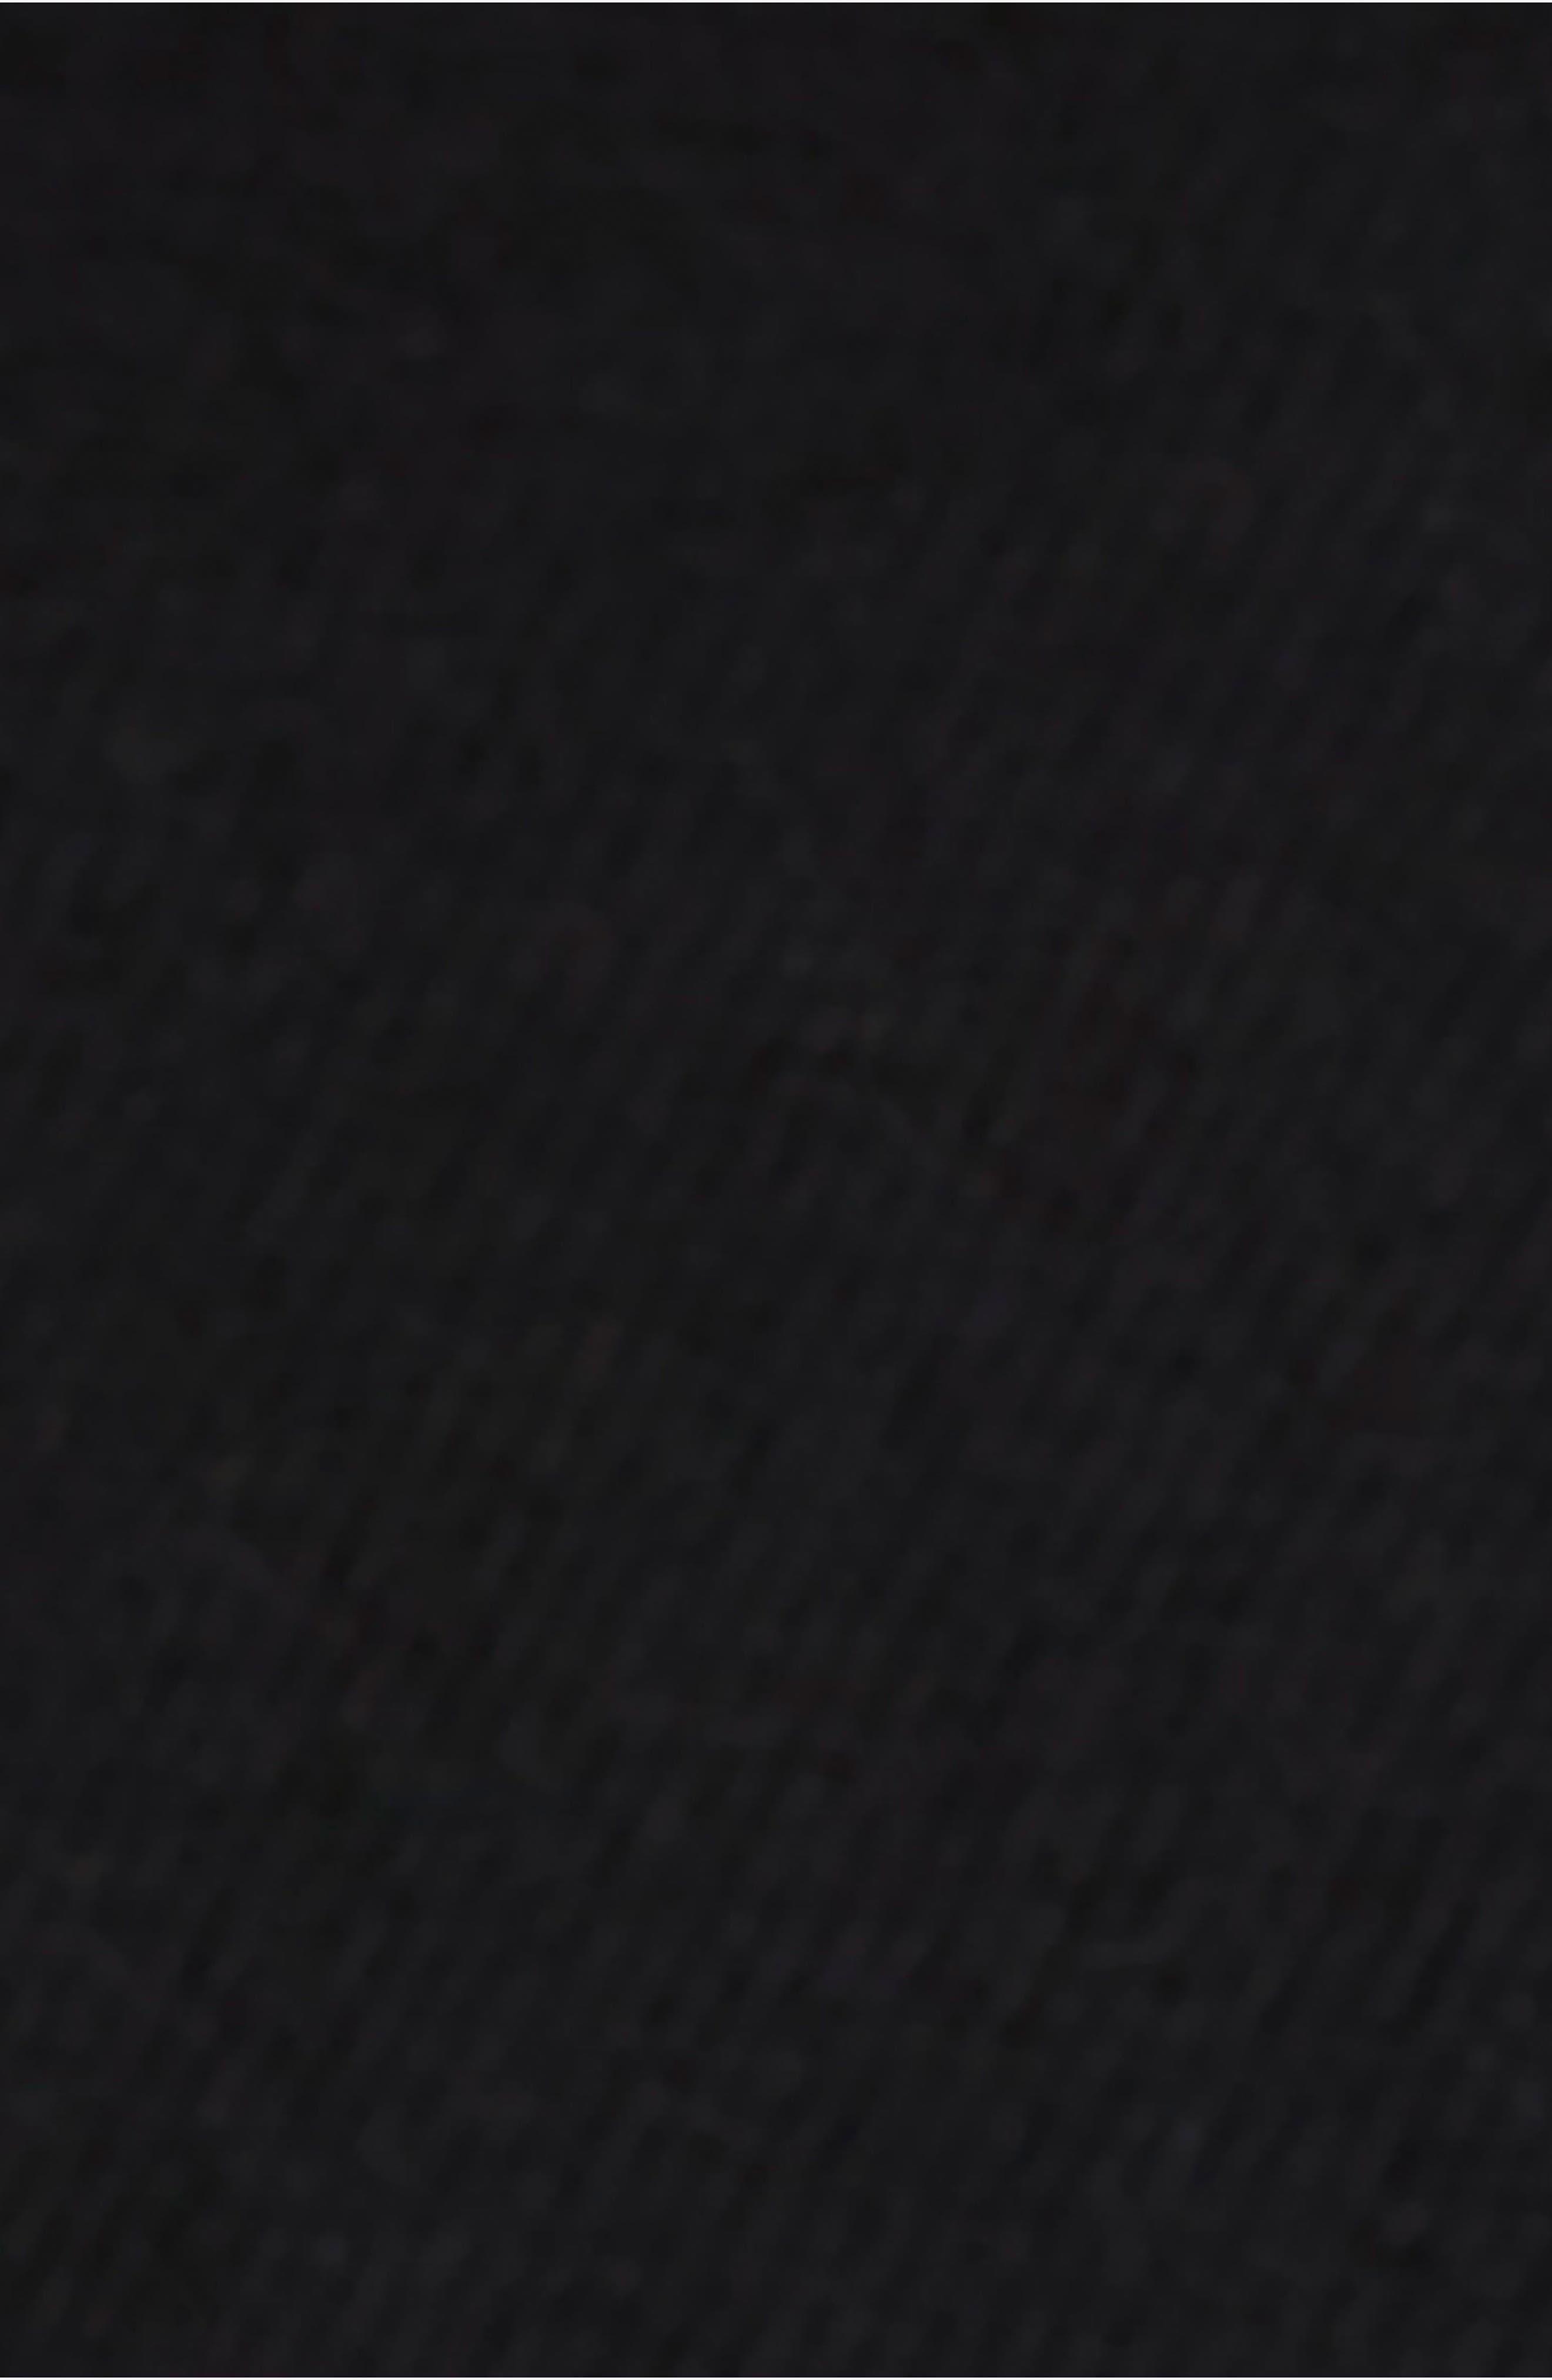 Needle & Thread Merino Wool Sweater,                             Alternate thumbnail 5, color,                             BLACK